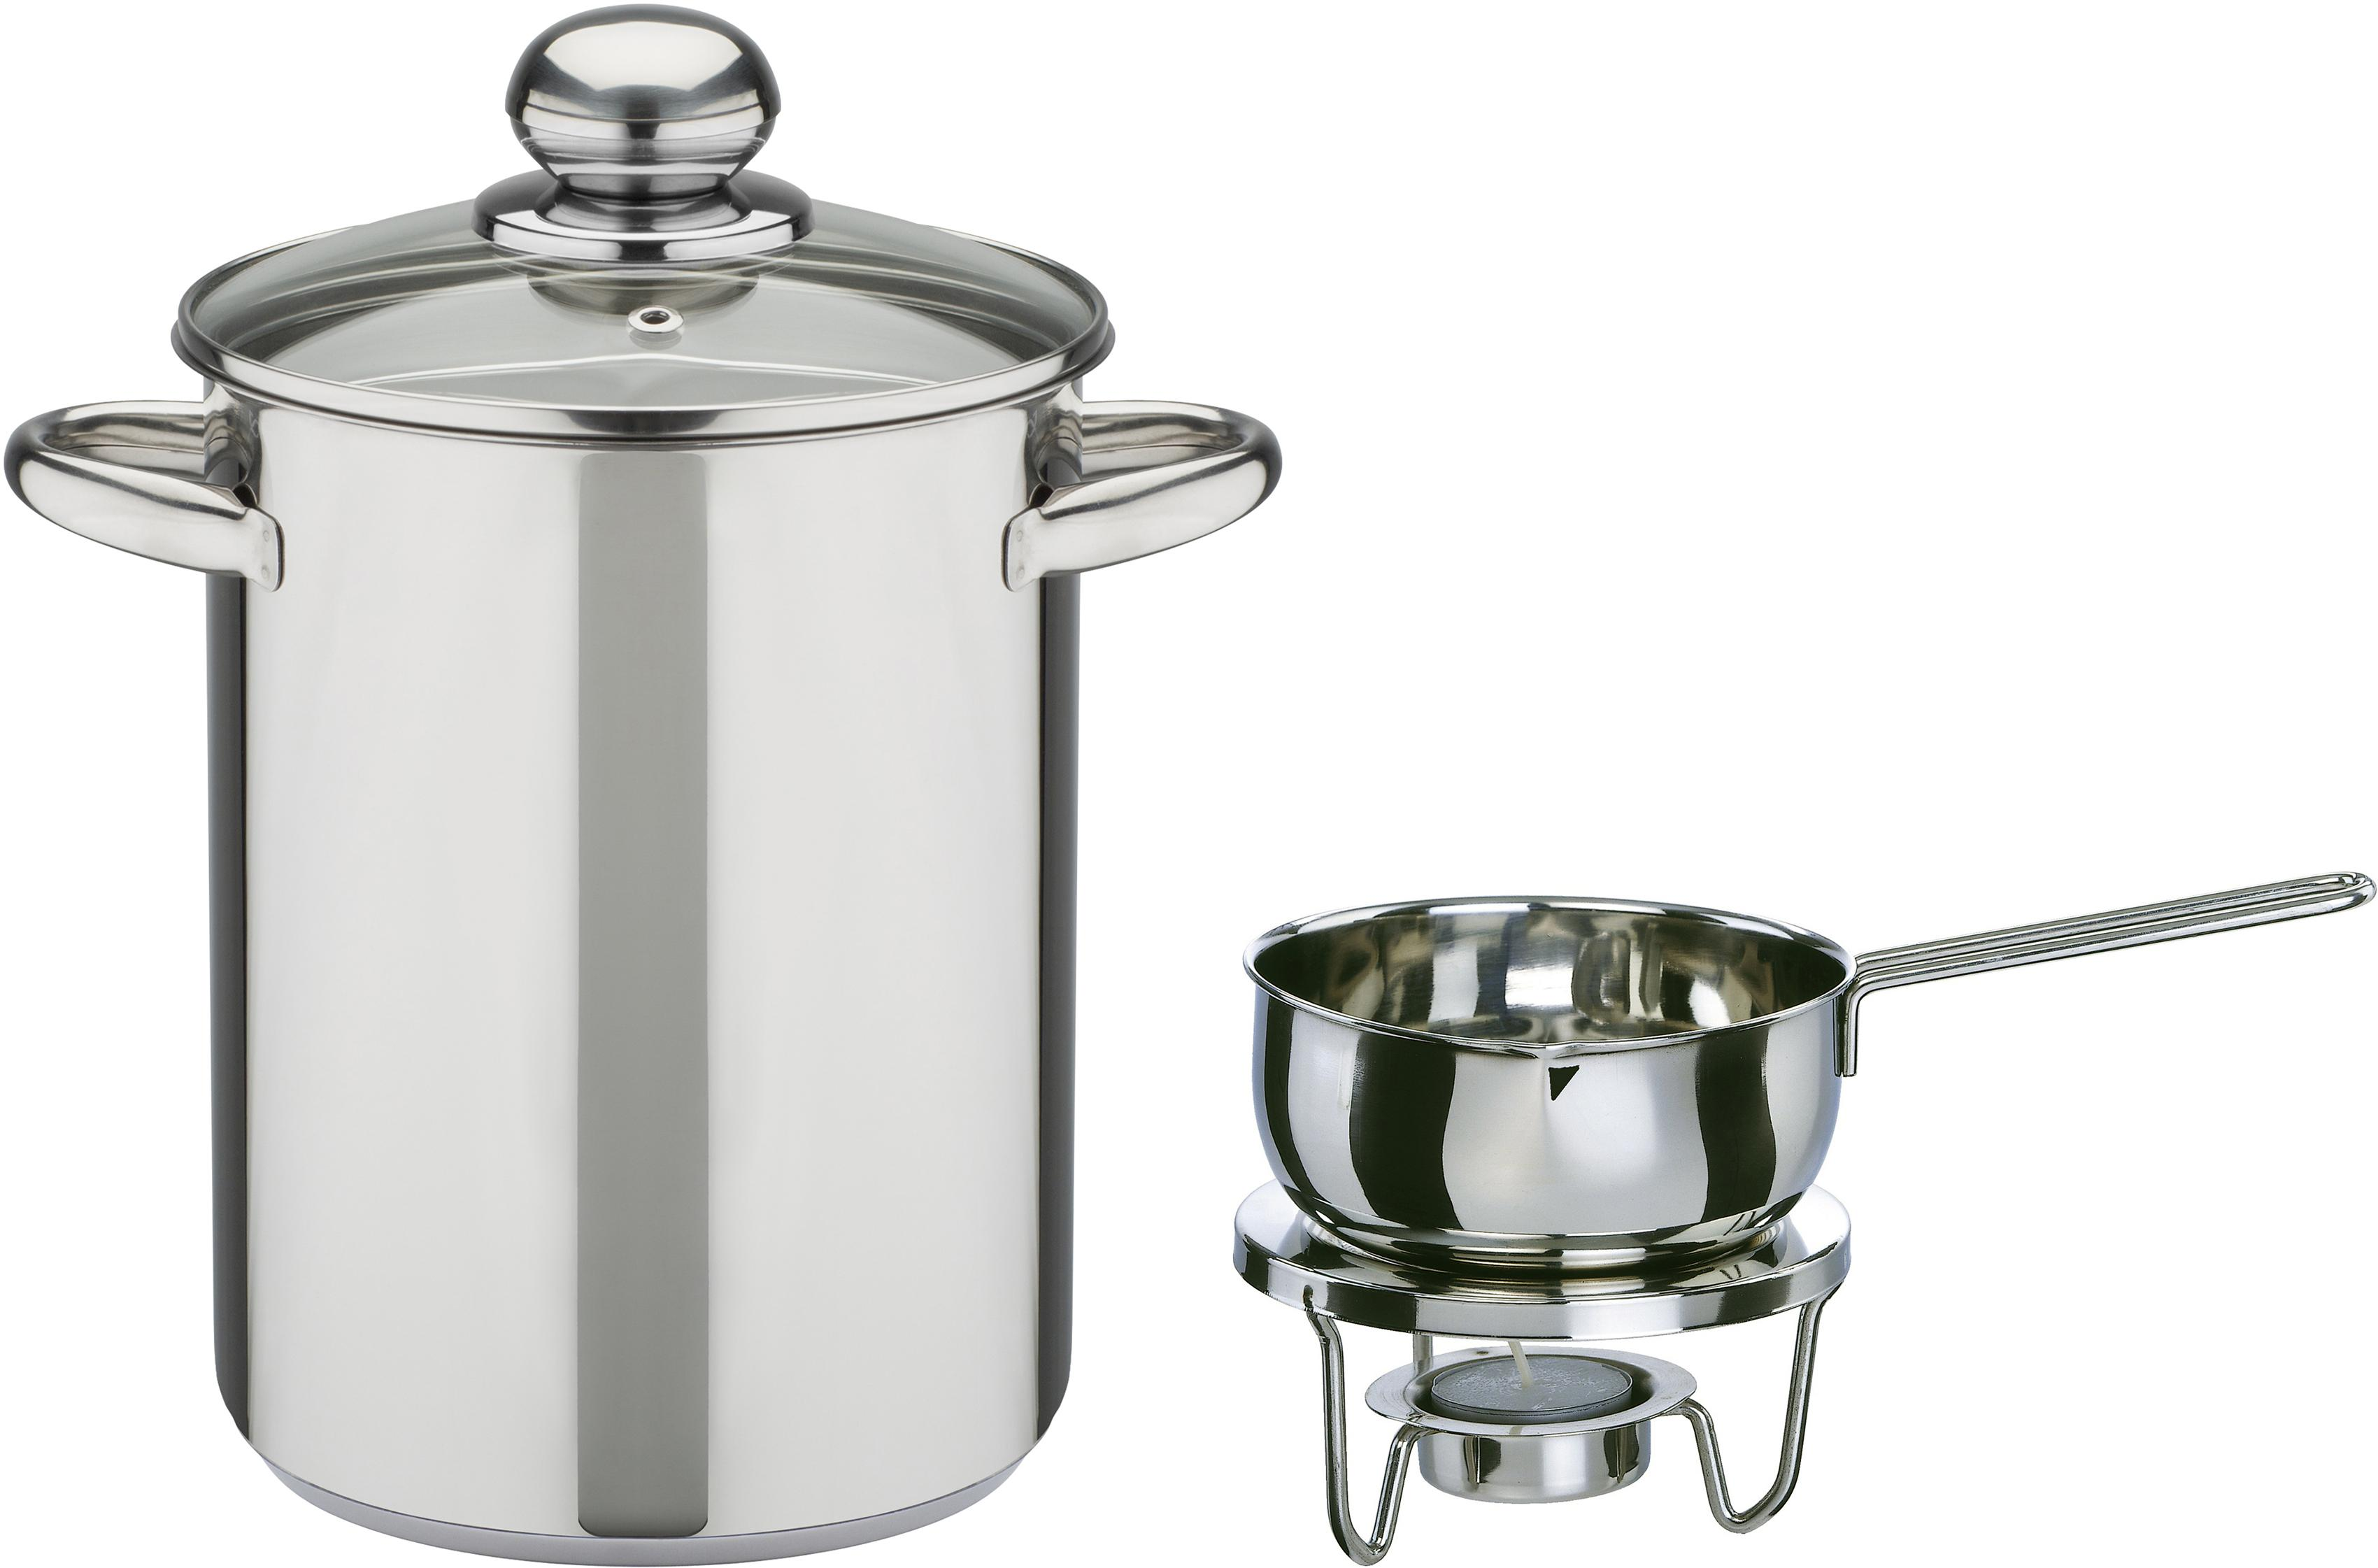 GSW Spargeltopf, Edelstahl, (Set, 4 tlg.), inkl. Saucenwärmer, Stövchen, Teelicht silberfarben Spargeltopf Töpfe